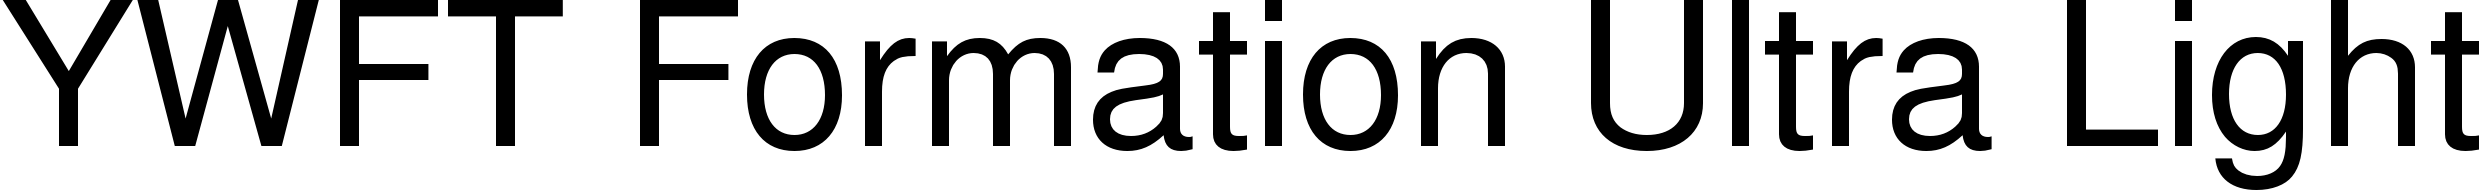 YWFT Formation Ultra Light